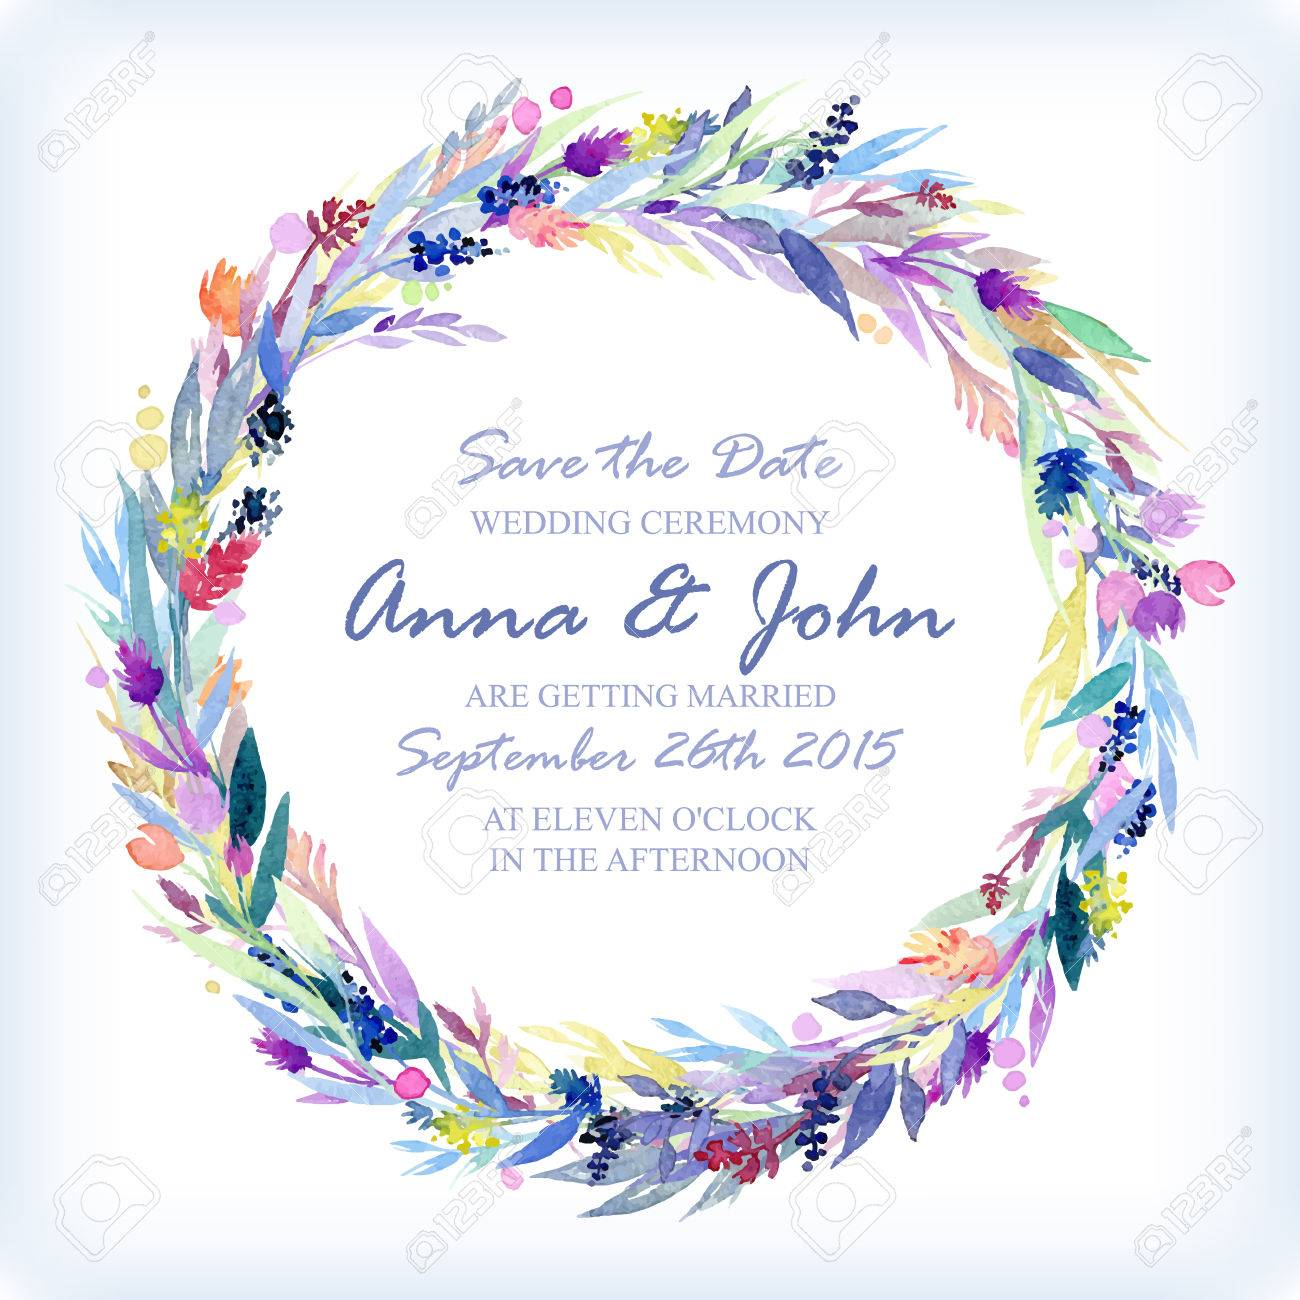 Wedding Invitation Design Template With Watercolor Floral Circular ...